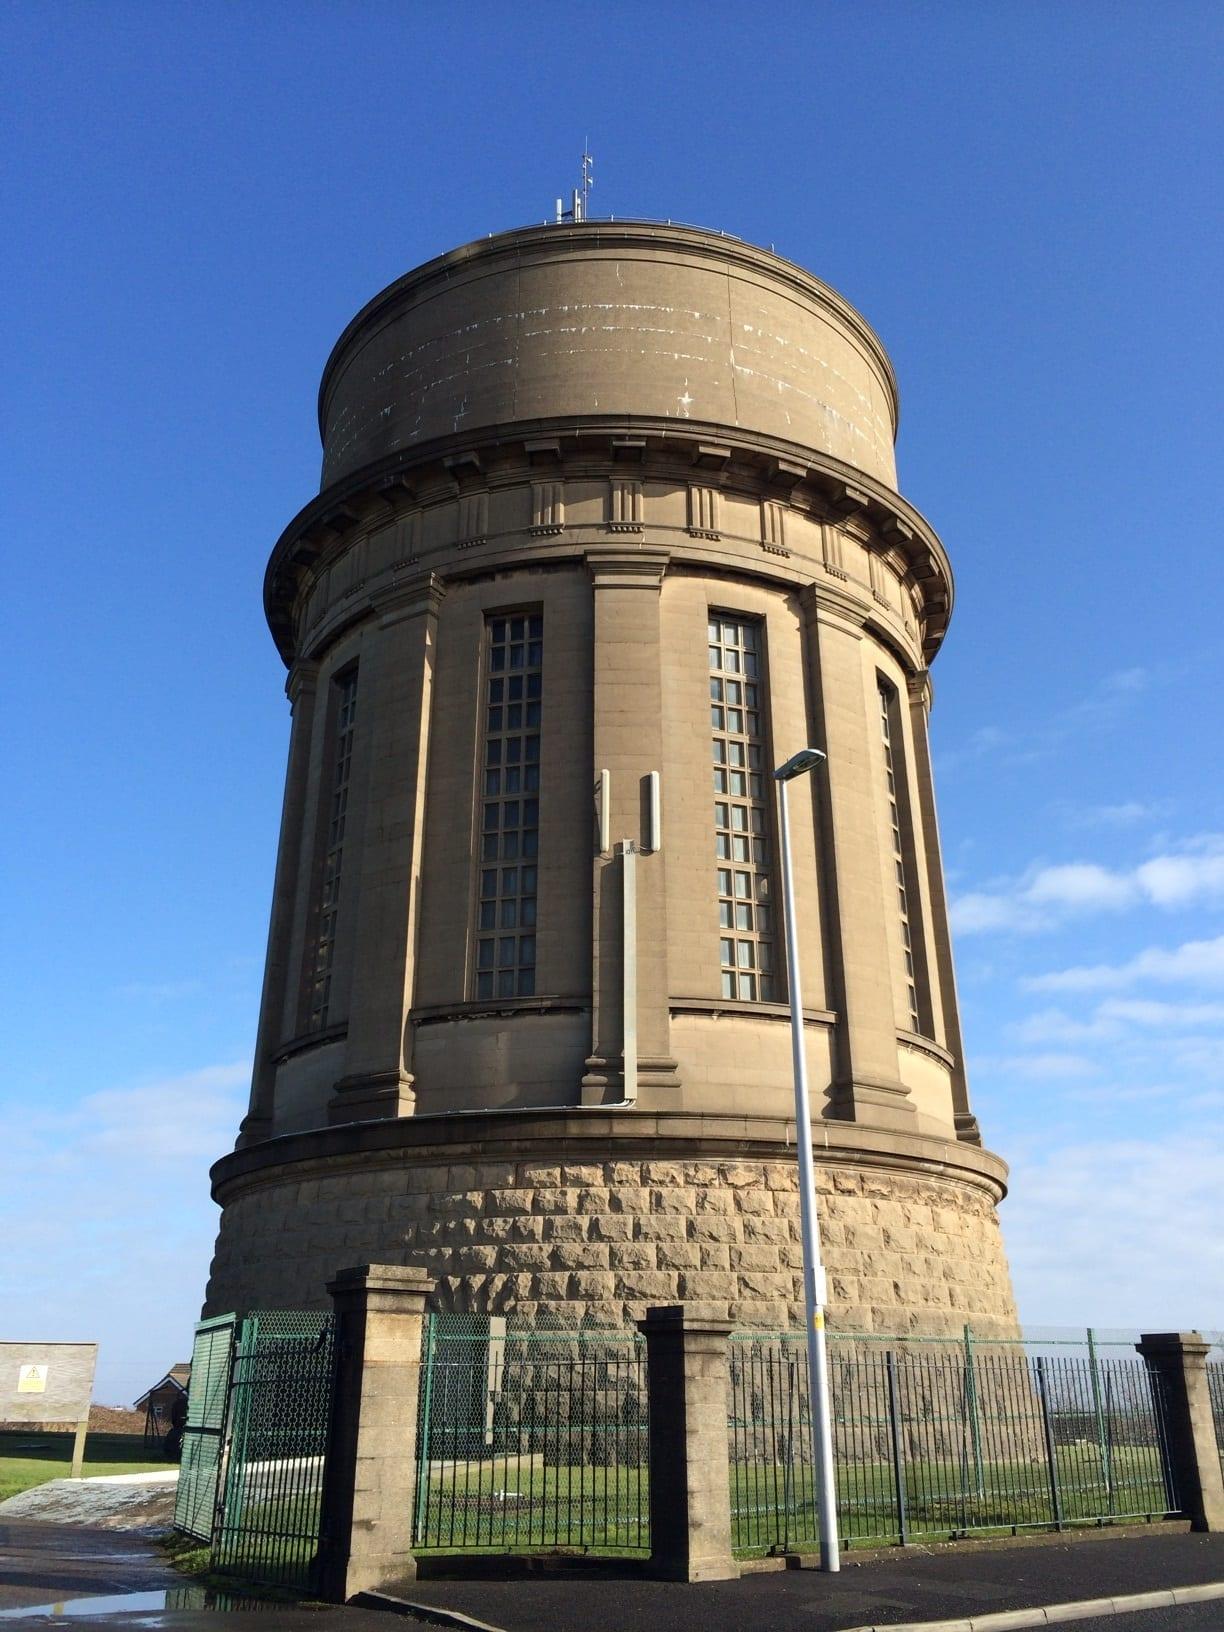 Warbreck Water Tower Blackpool